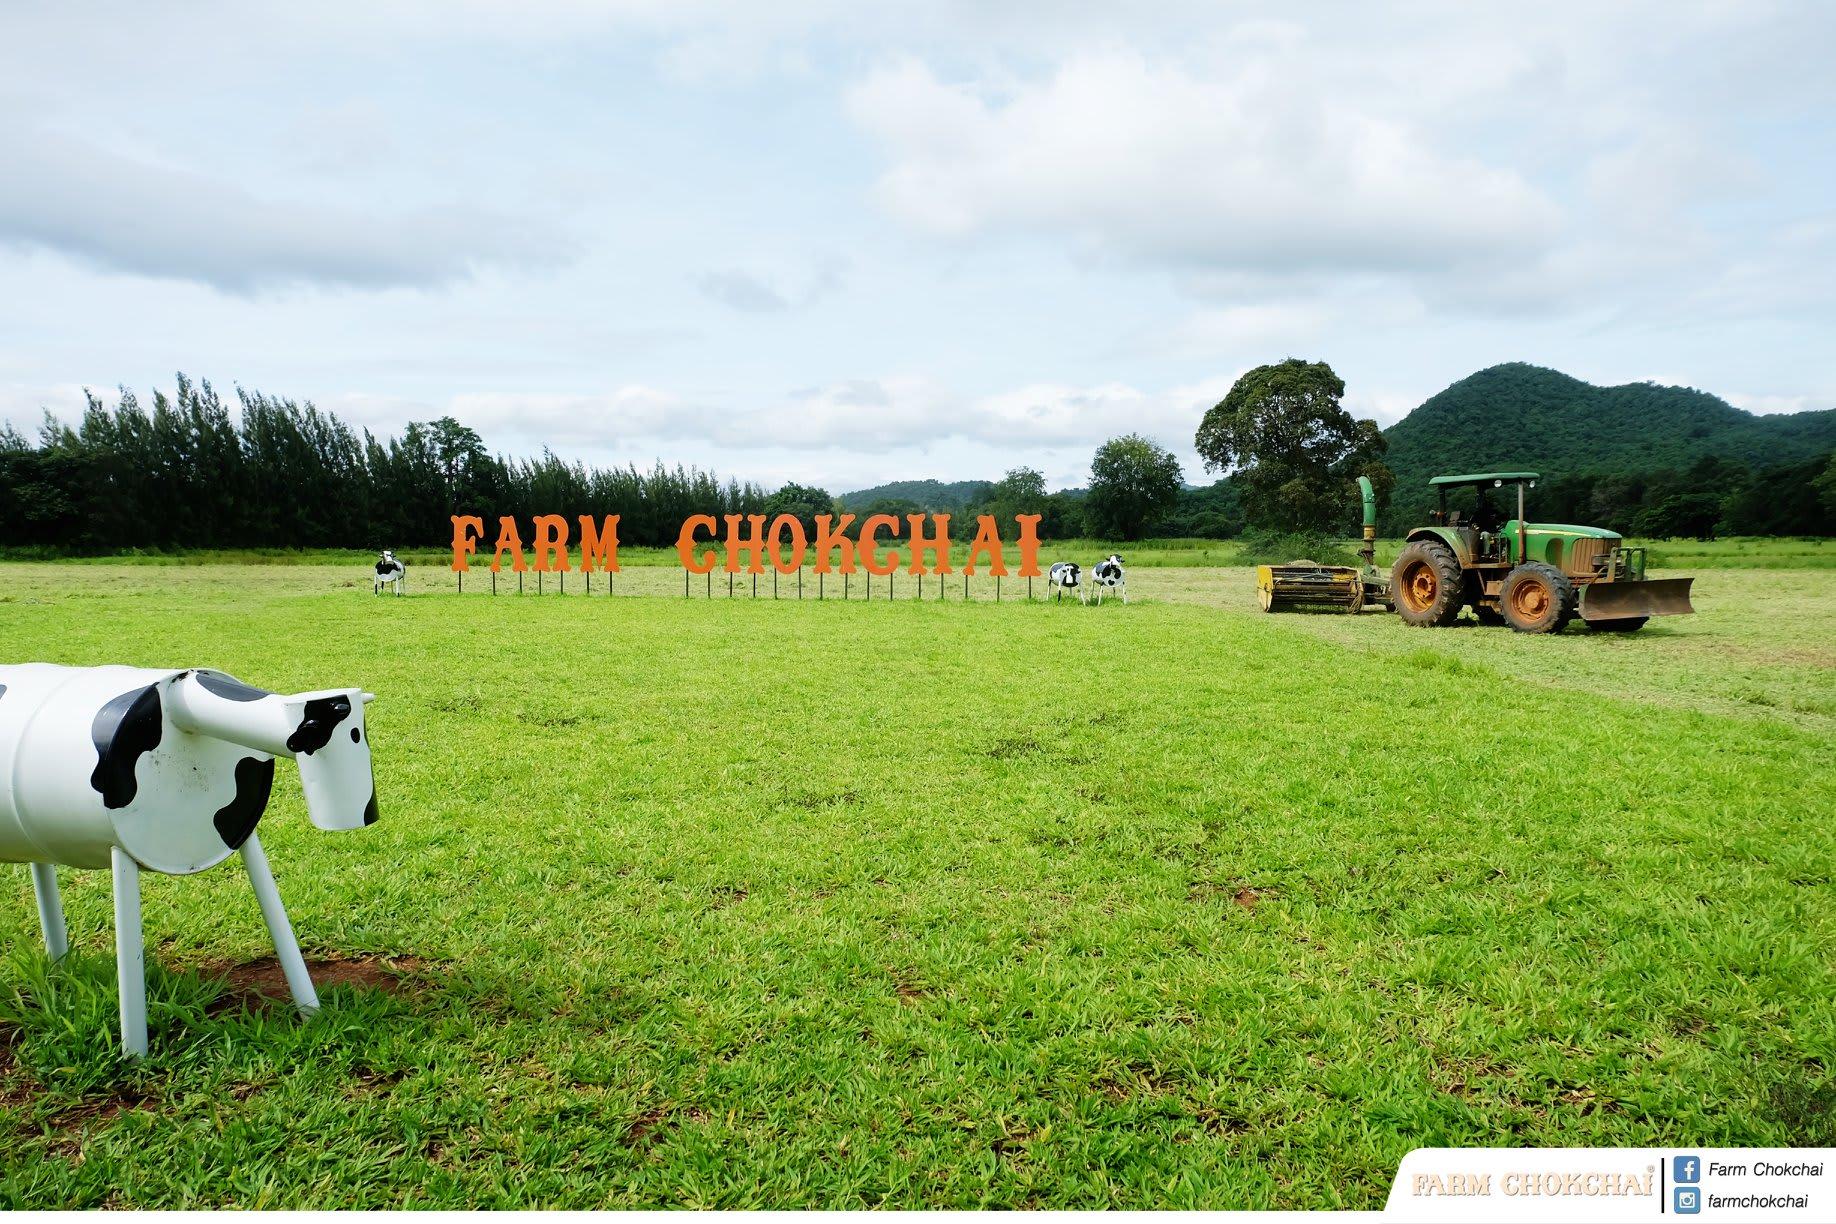 Farm Chokchai 來源:粉絲專頁